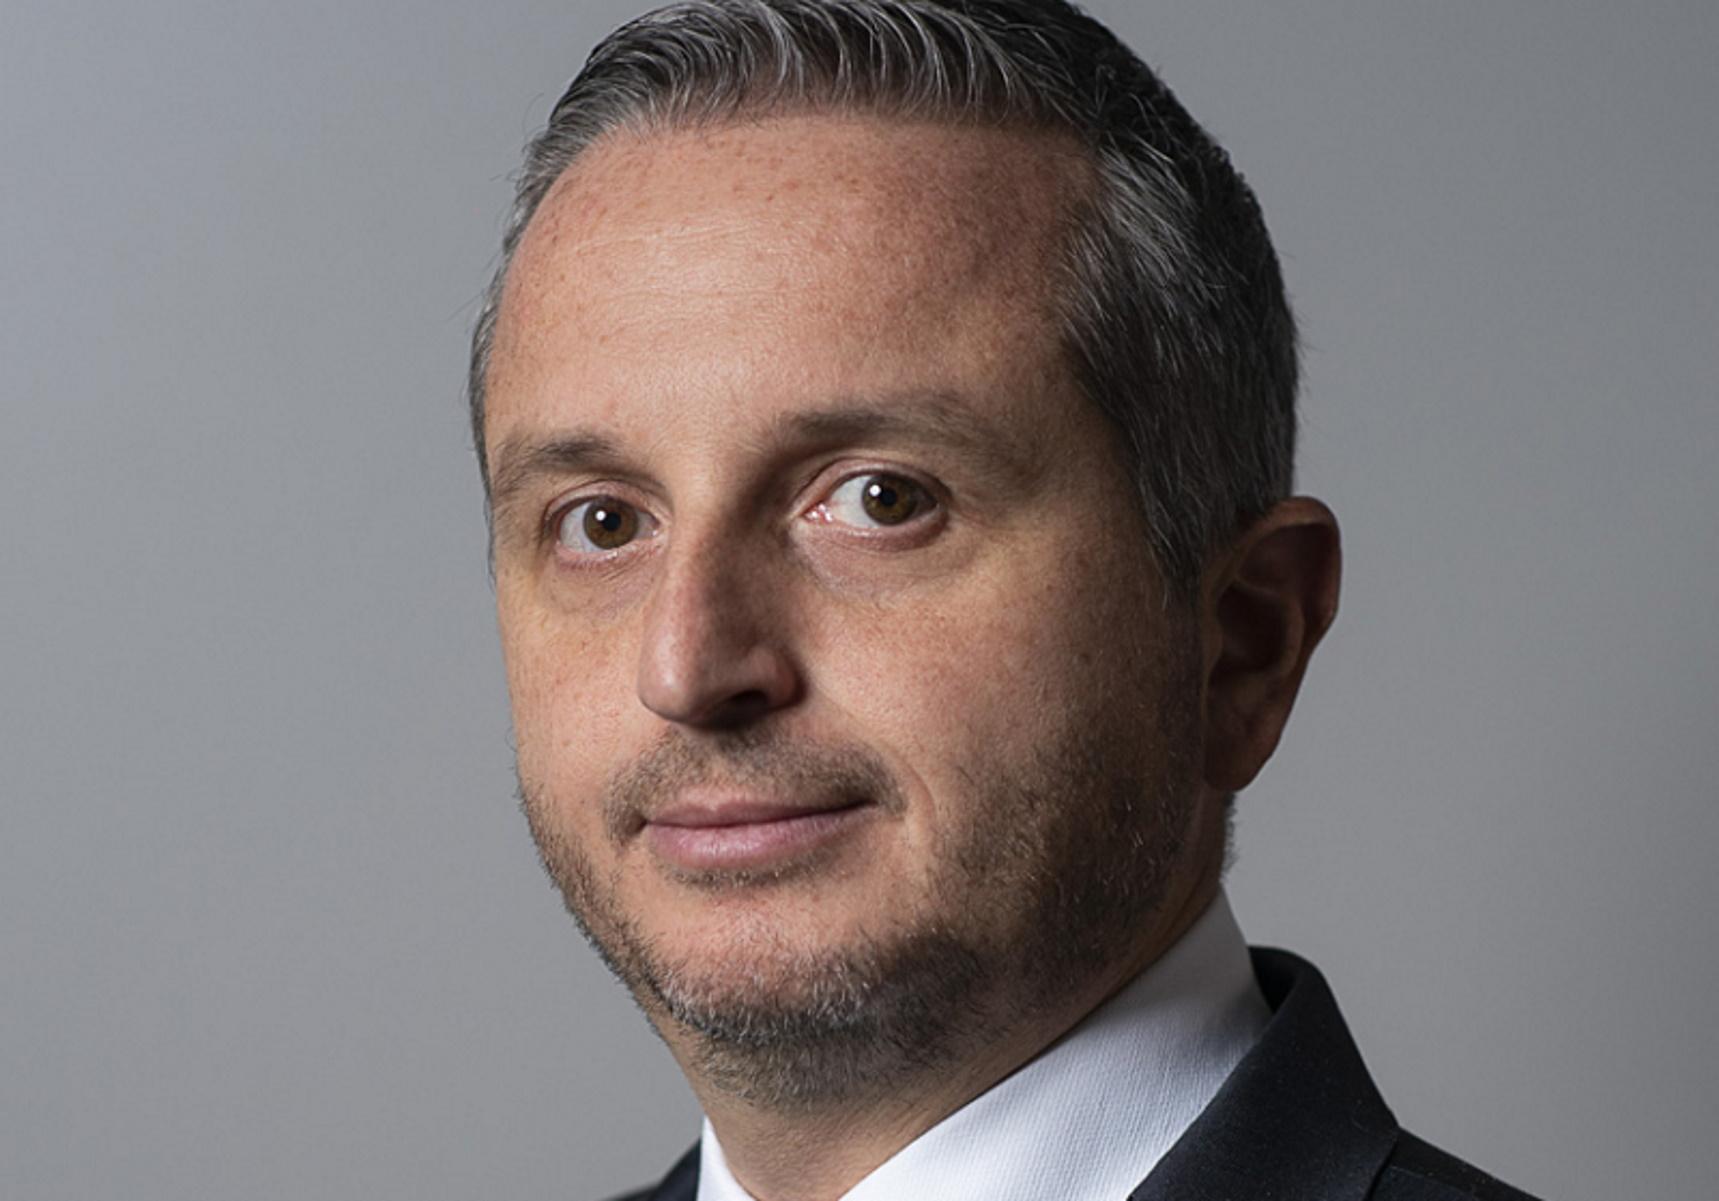 Public – MediaMarkt: Διοικητική αλλαγή – Ο Ρ. Μπουρλάς, νέος CEO στον όμιλο